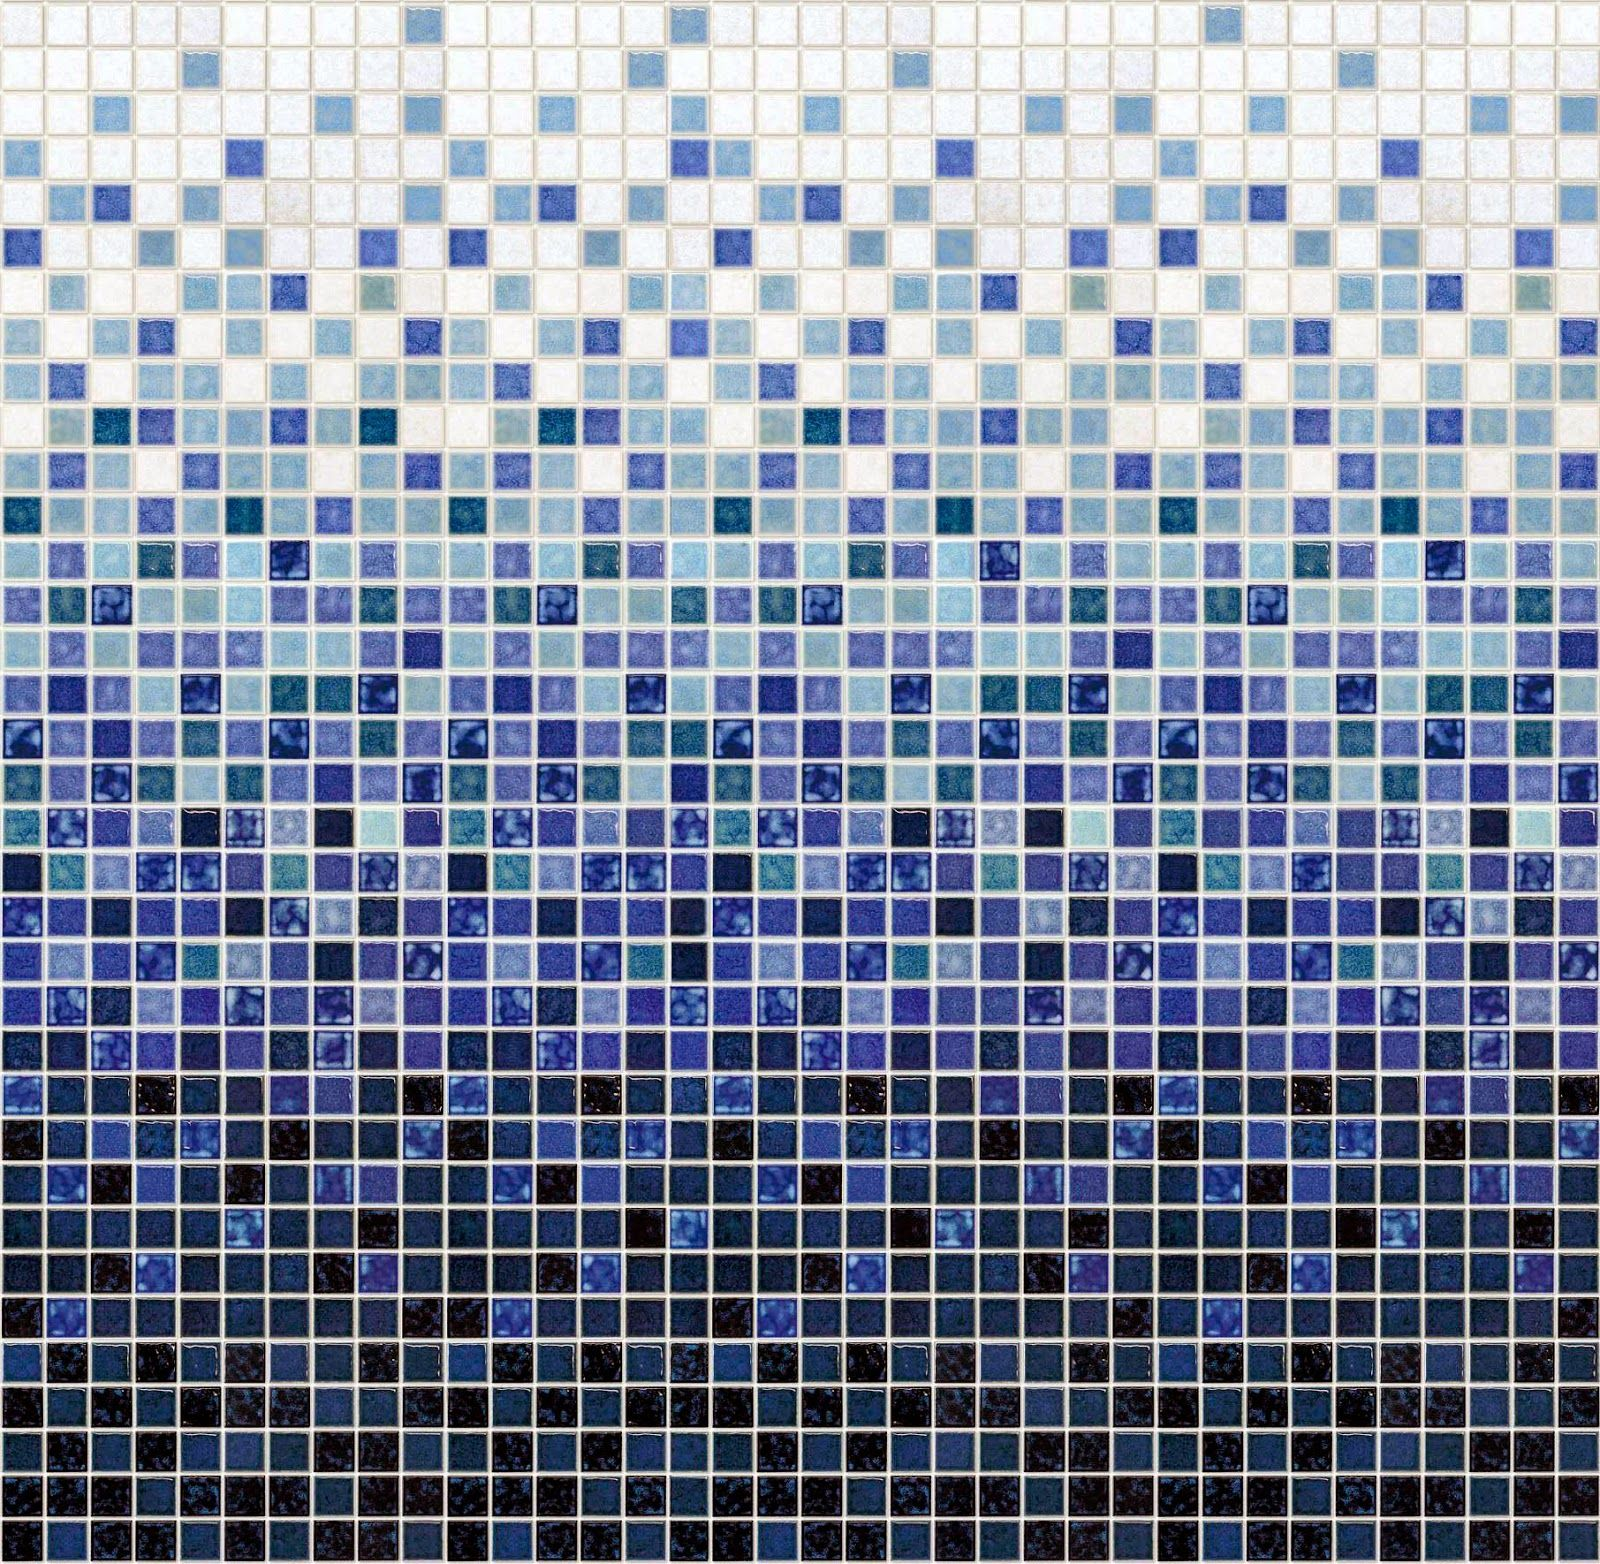 Textured Mosaic Tiles | Tile Design Ideas